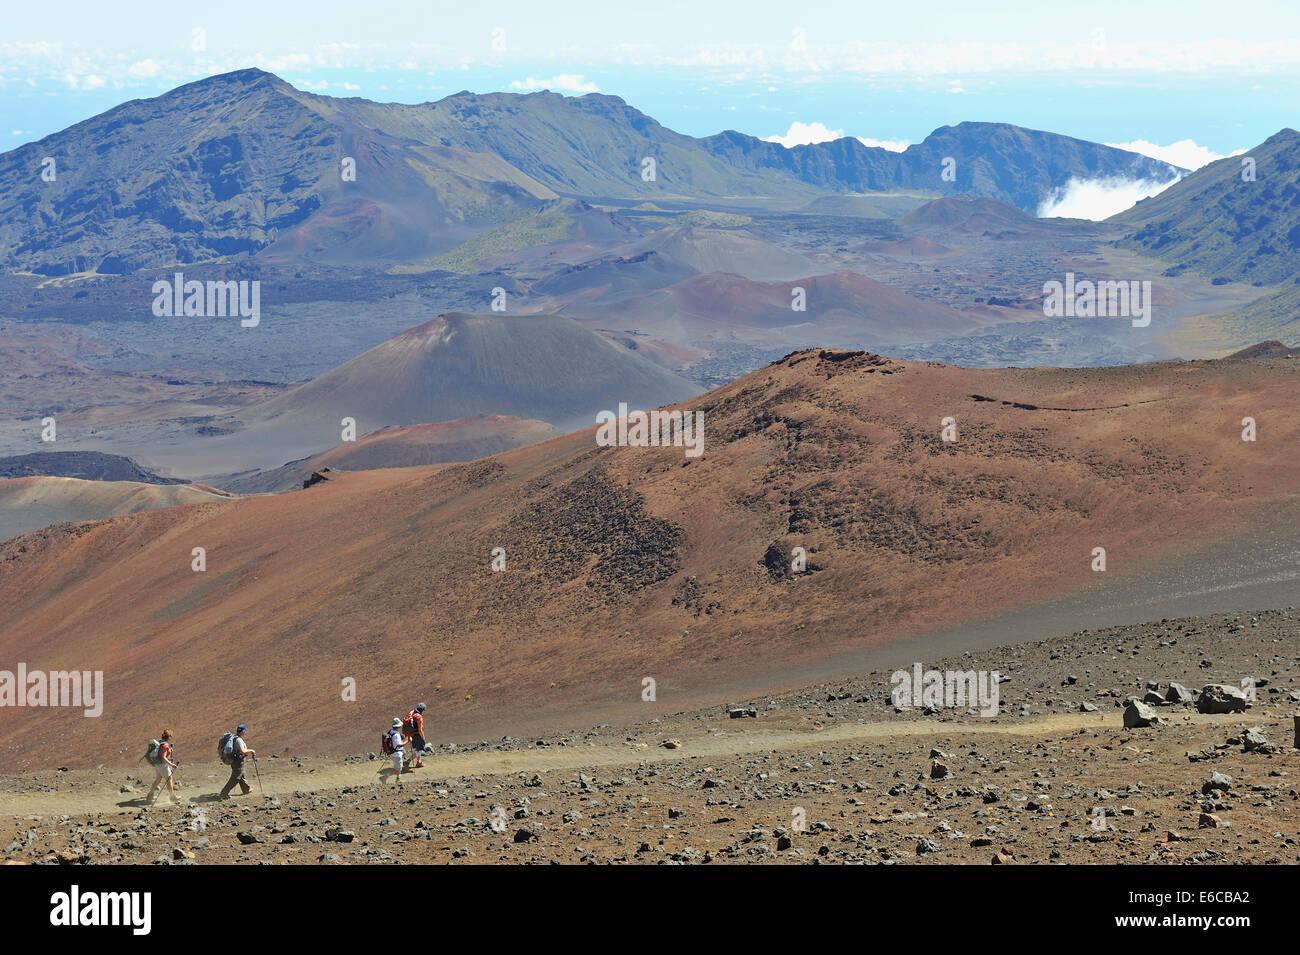 Hawaii - Hikers in the Haleakala crater, Haleakala National Park, Maui Island. - Stock Image